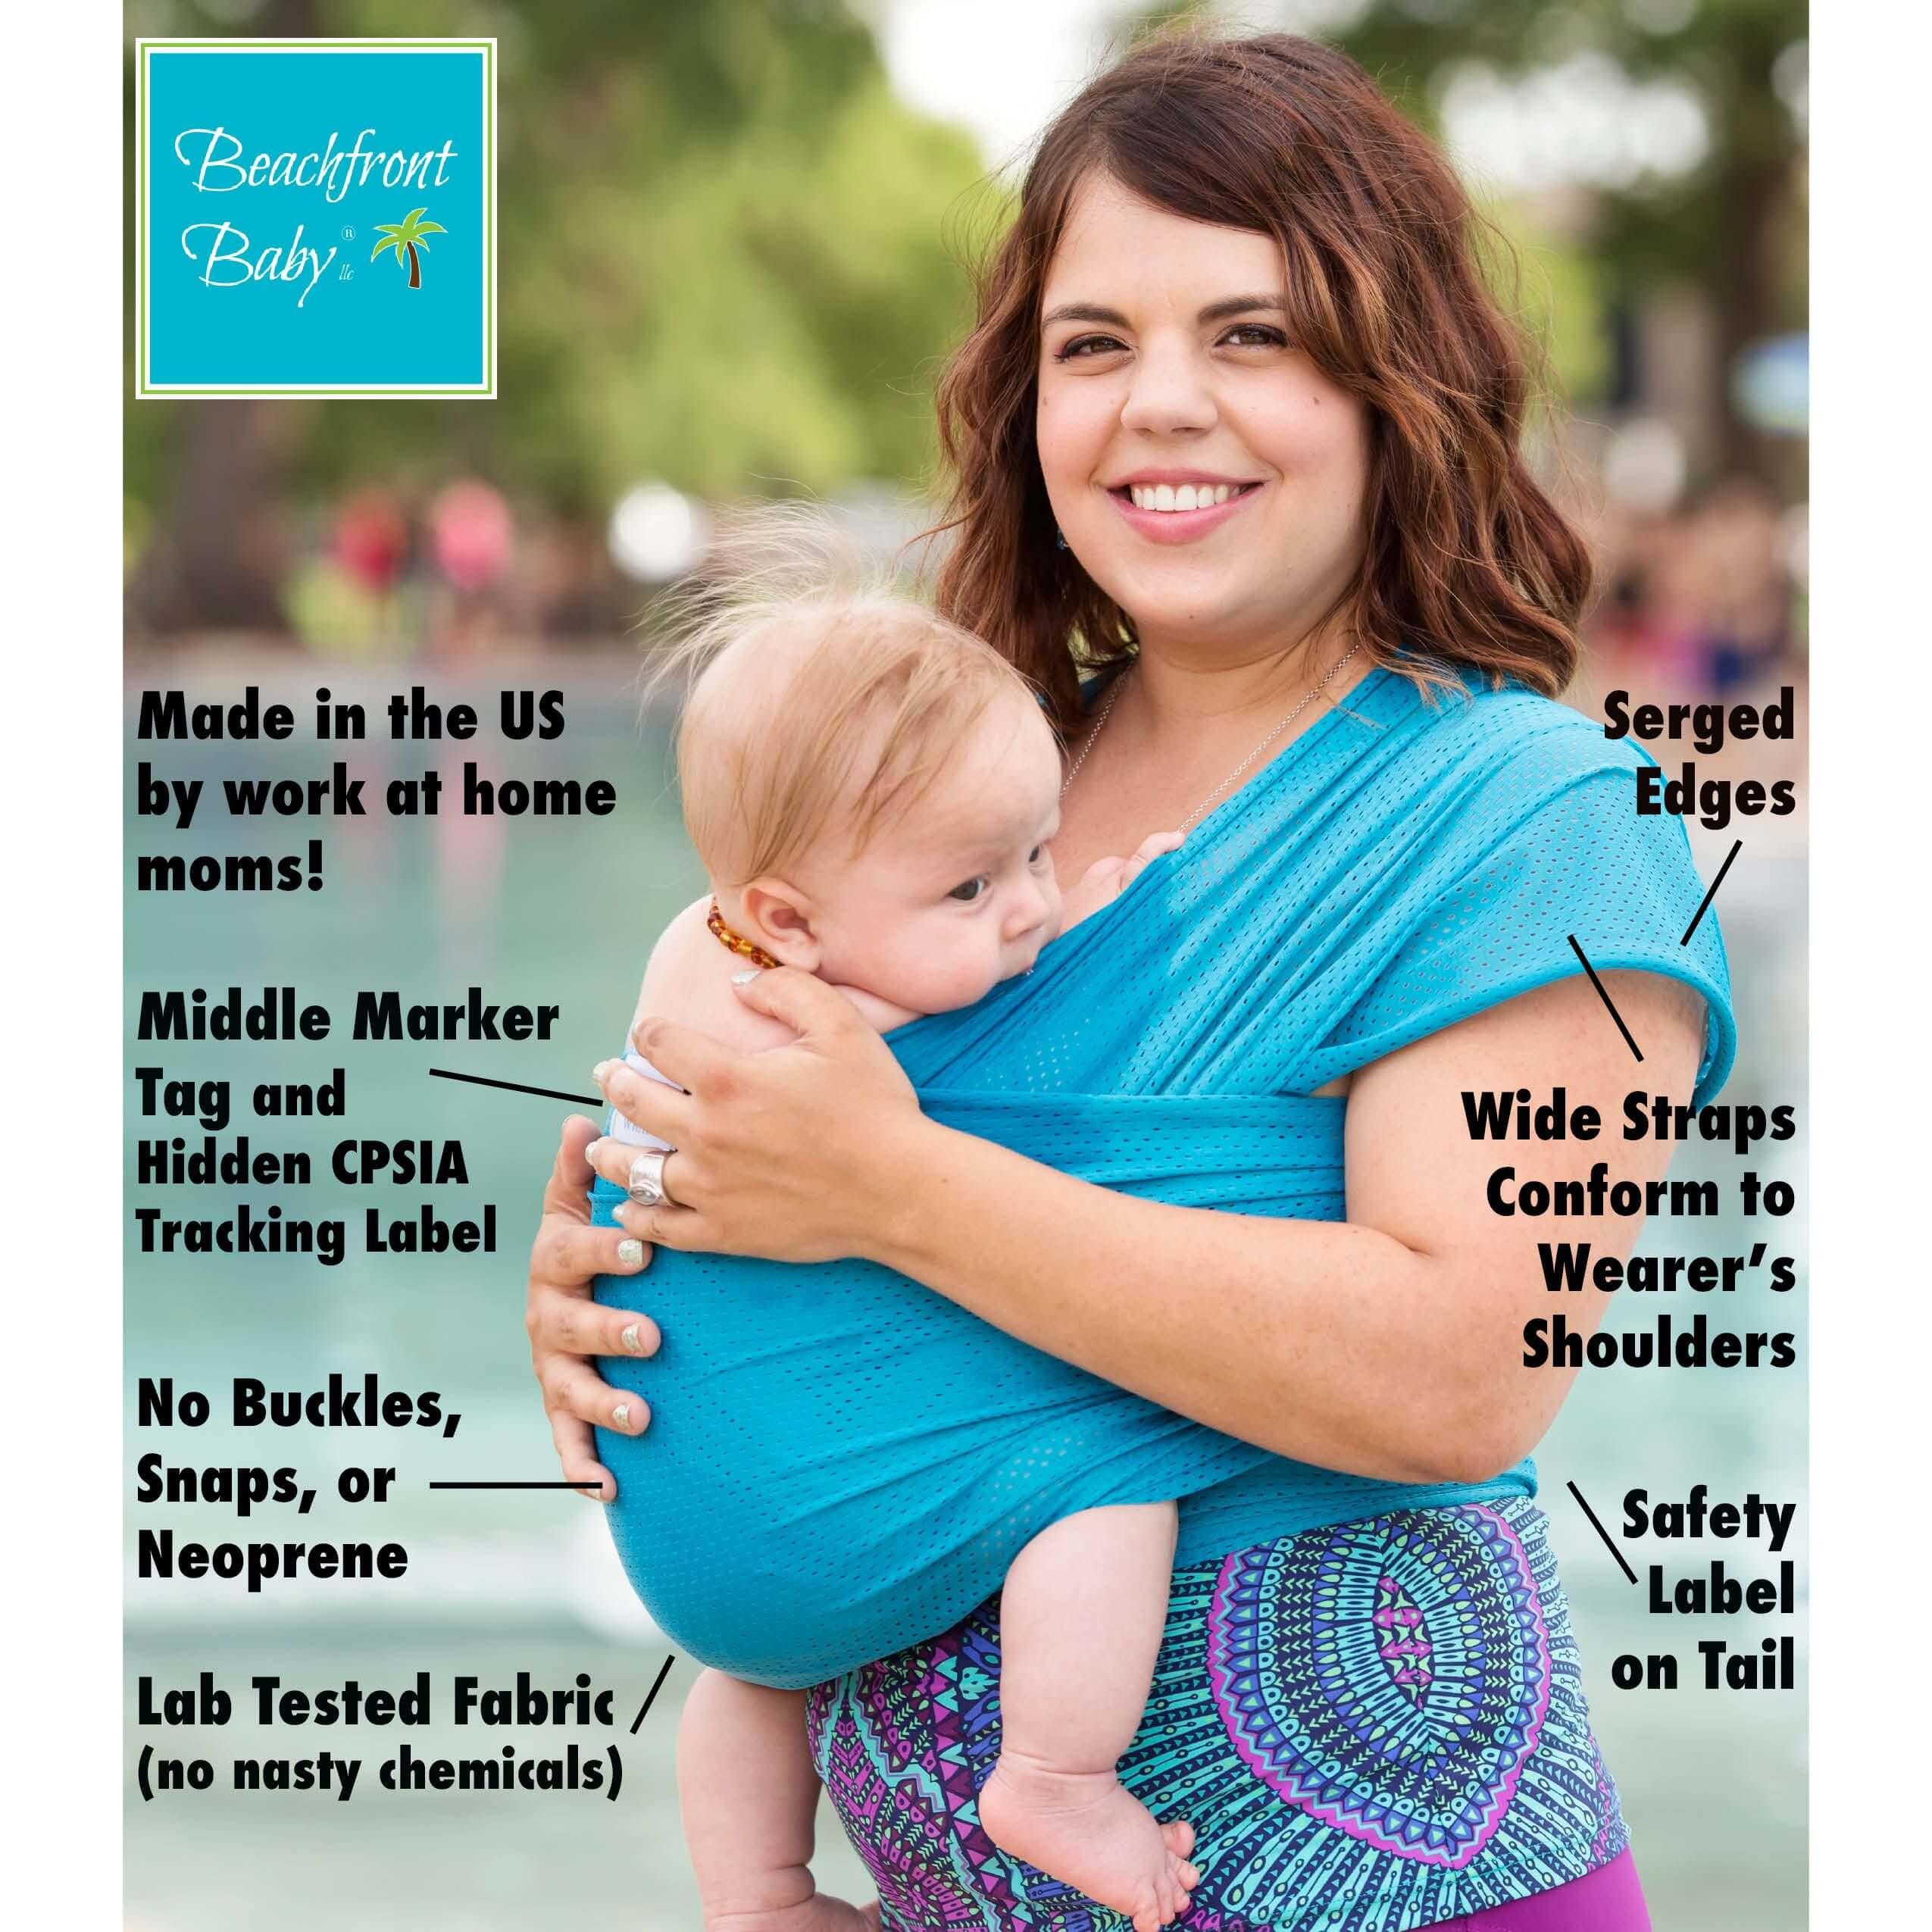 Xl Beachfront Baby Wrap Beachfront Baby Versatile Baby Carriers